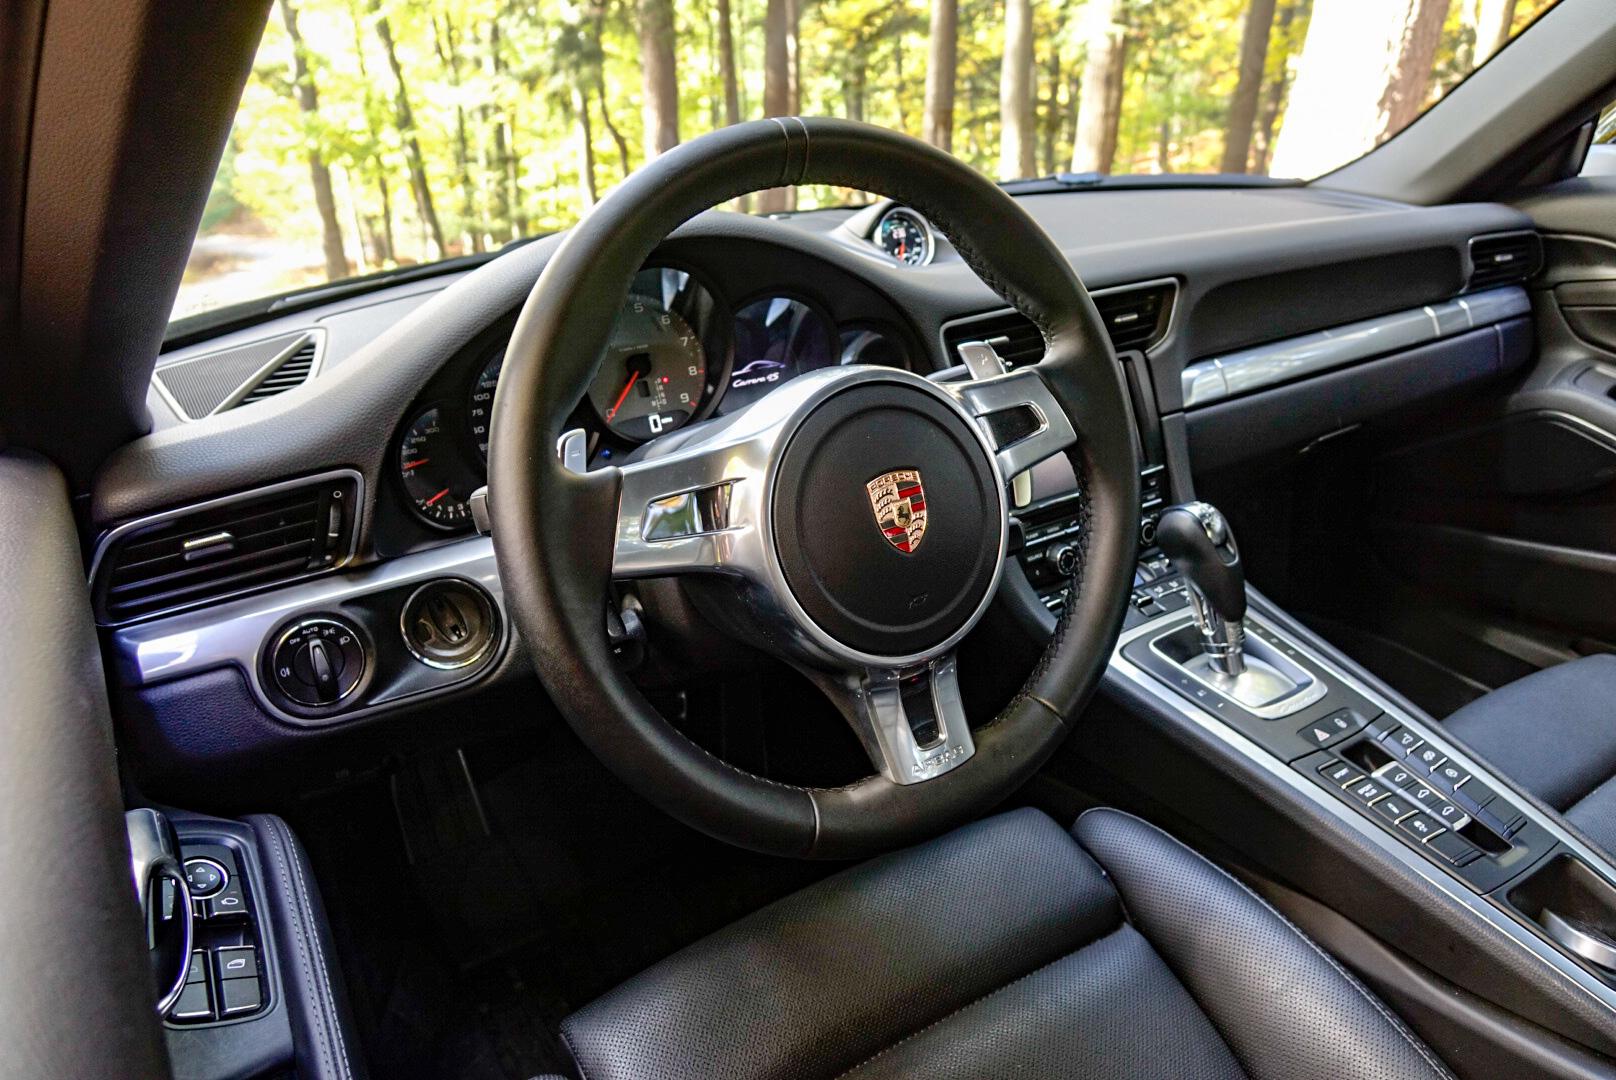 2013 Porsche 911 Carrera 4S interior